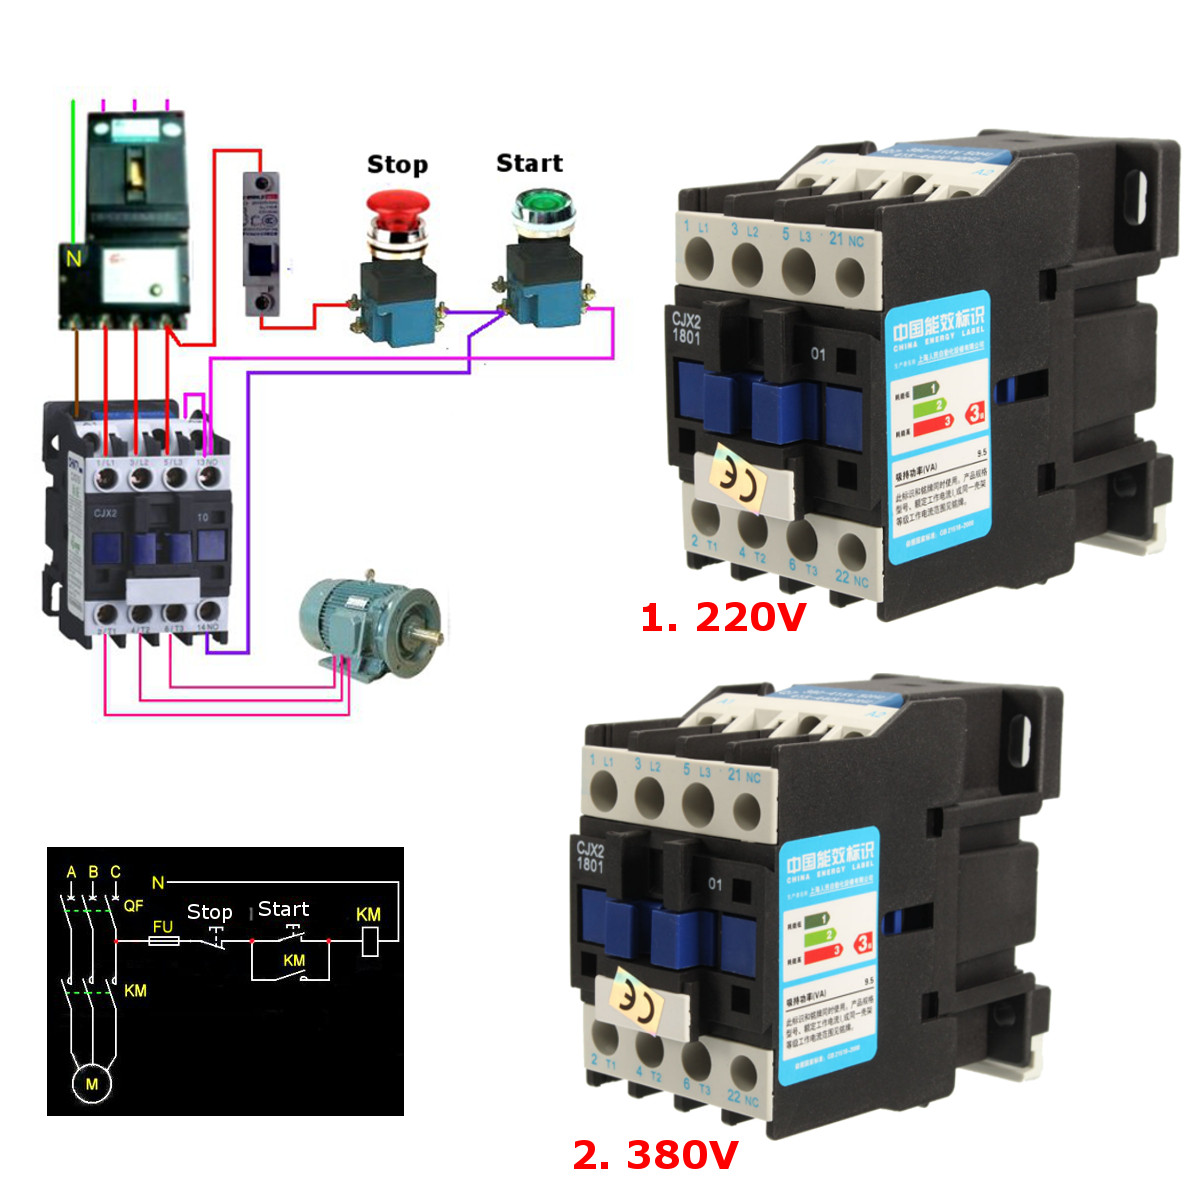 Abb Soft Starter Wiring Diagram Cjx2 1801 Ac 220v 380v 18a Contactor Motor Starter Relay 3